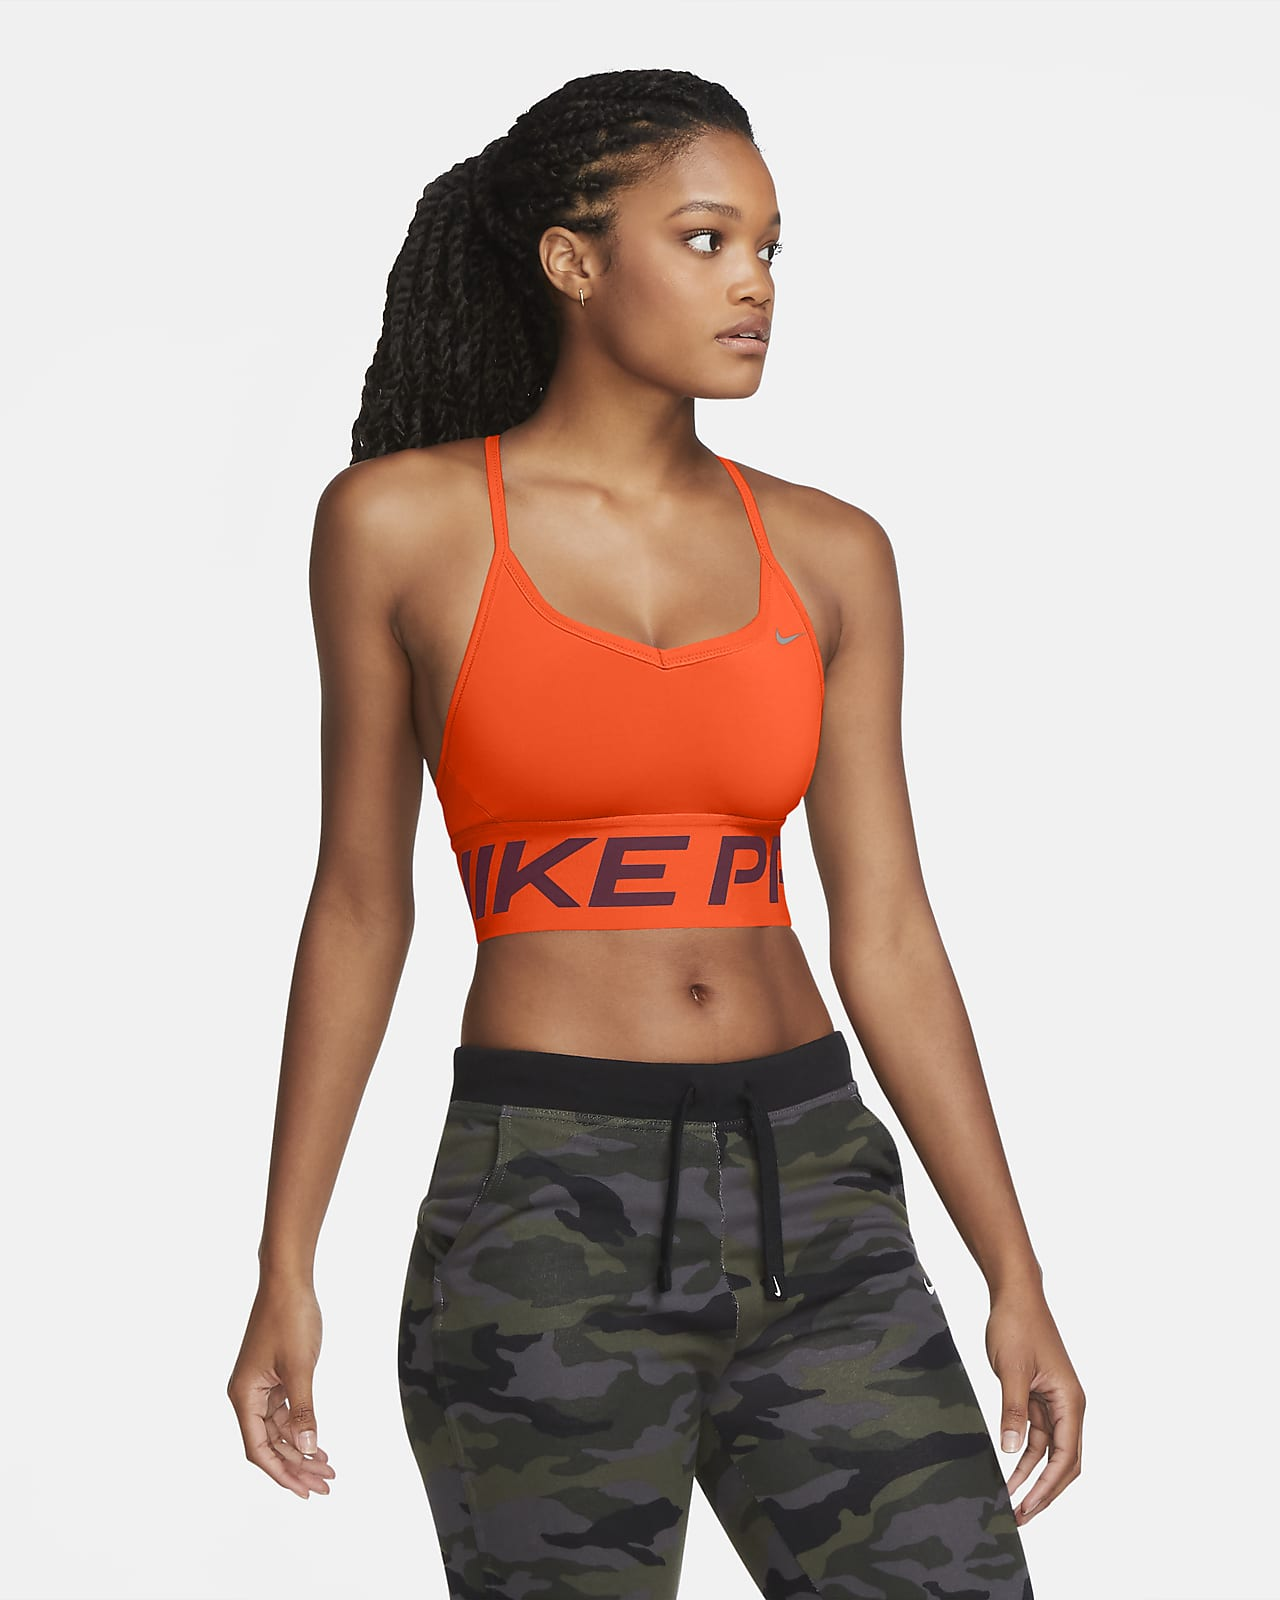 Nike Pro Indy Women's Light-Support Sports Bra